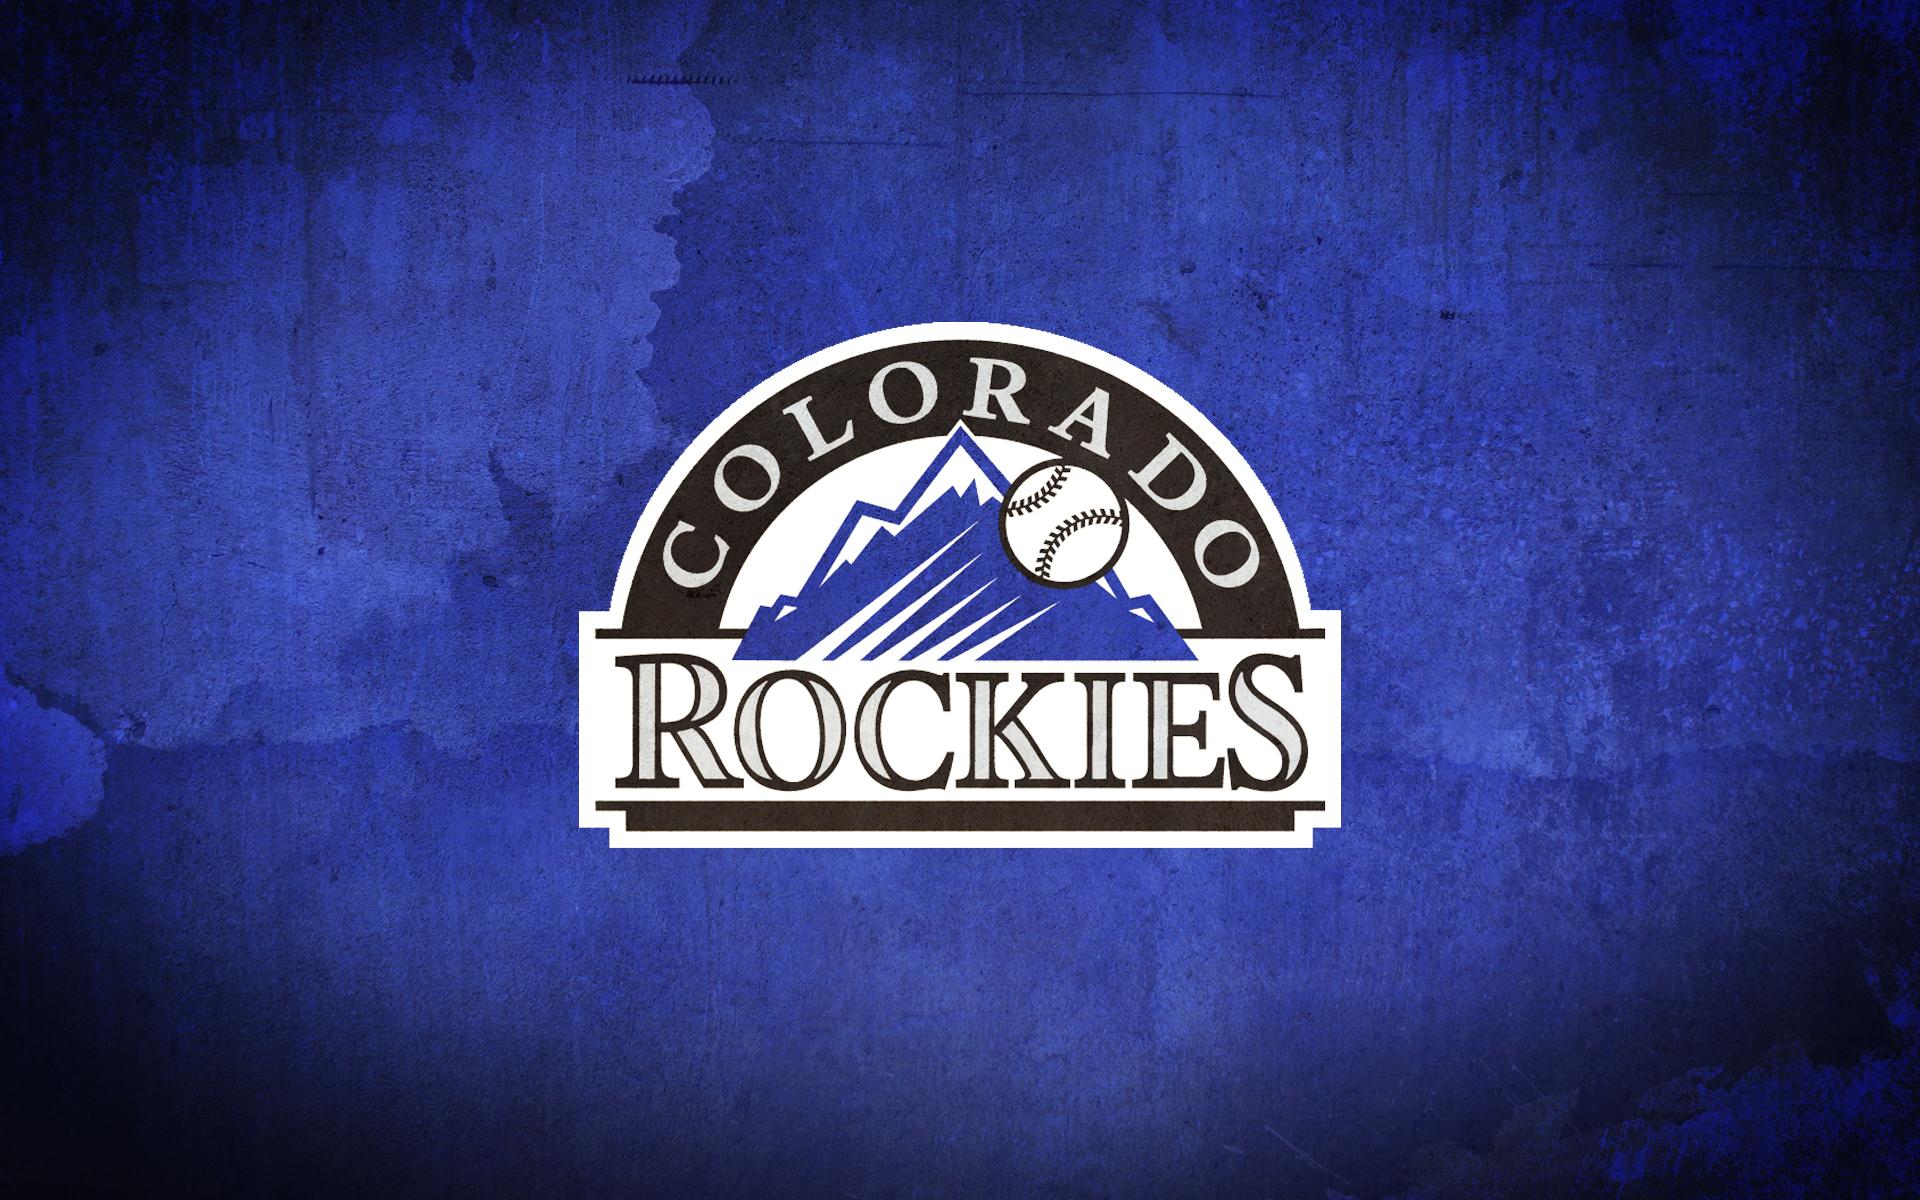 Colorado Rockies 1920 x 1200 1024 x 640 1920x1200